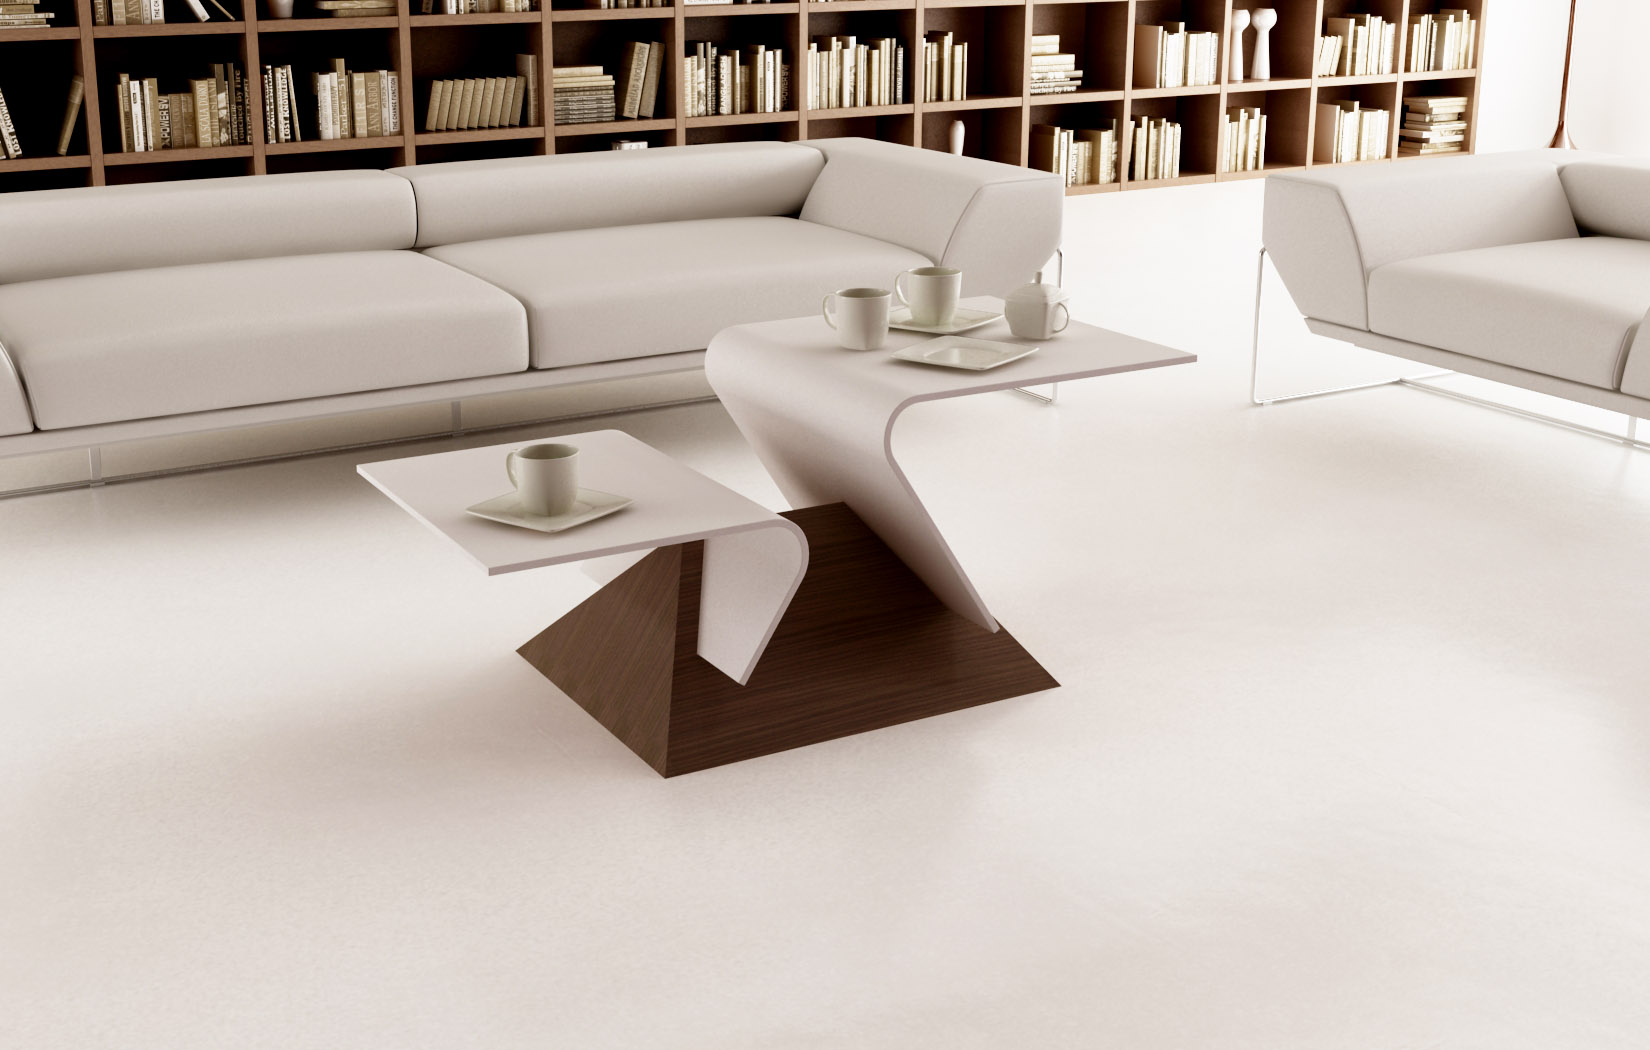 Lune design tavolino da caffe 39 39 virgola 39 Salon moderne bois